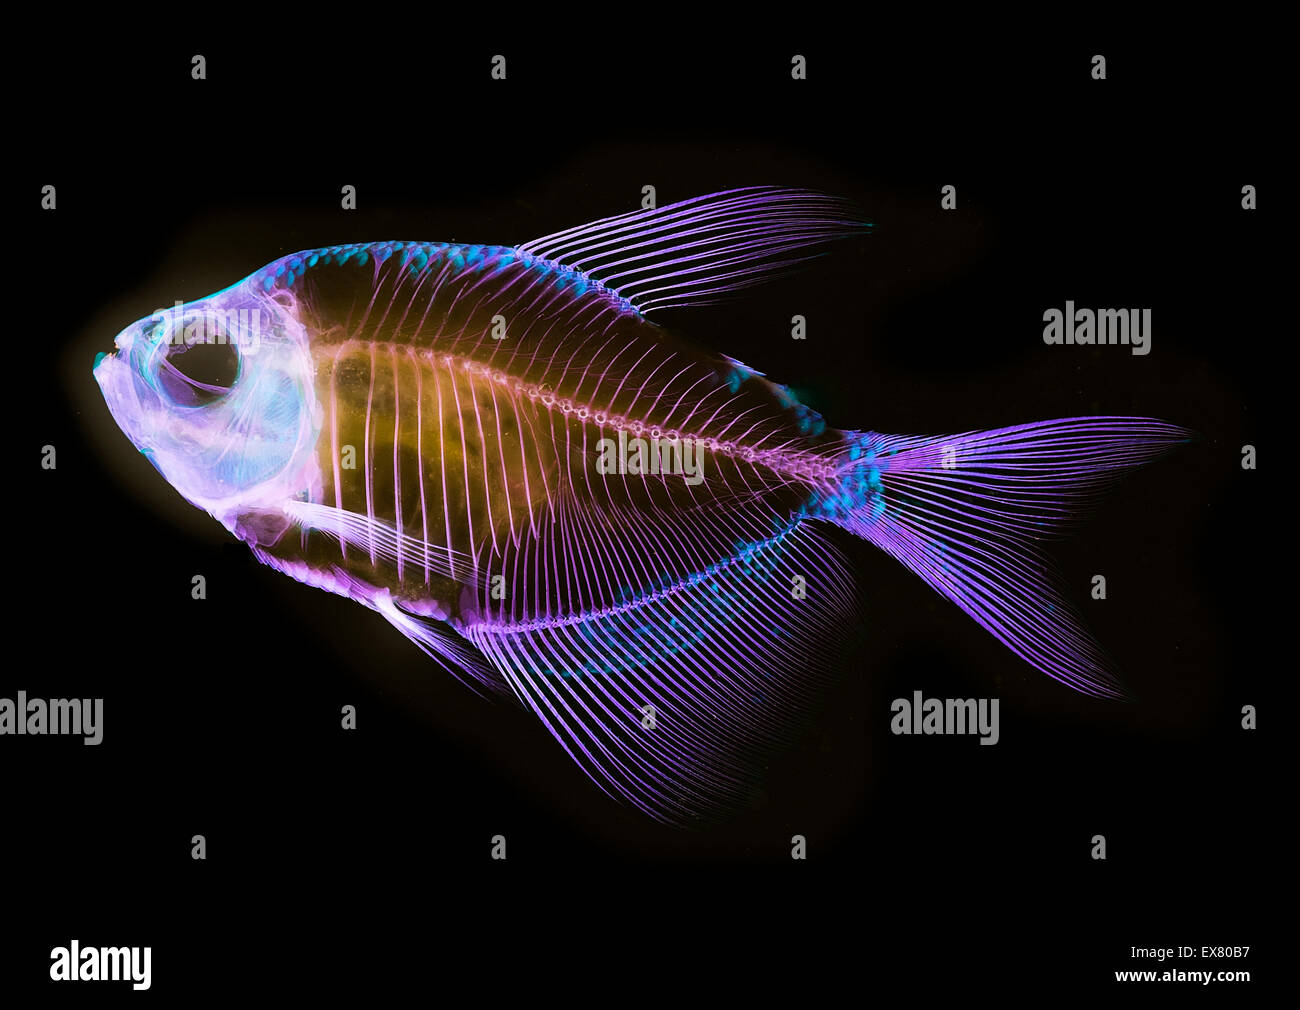 Fancy Fish Skeleton Anatomy Crest - Human Anatomy Images ...